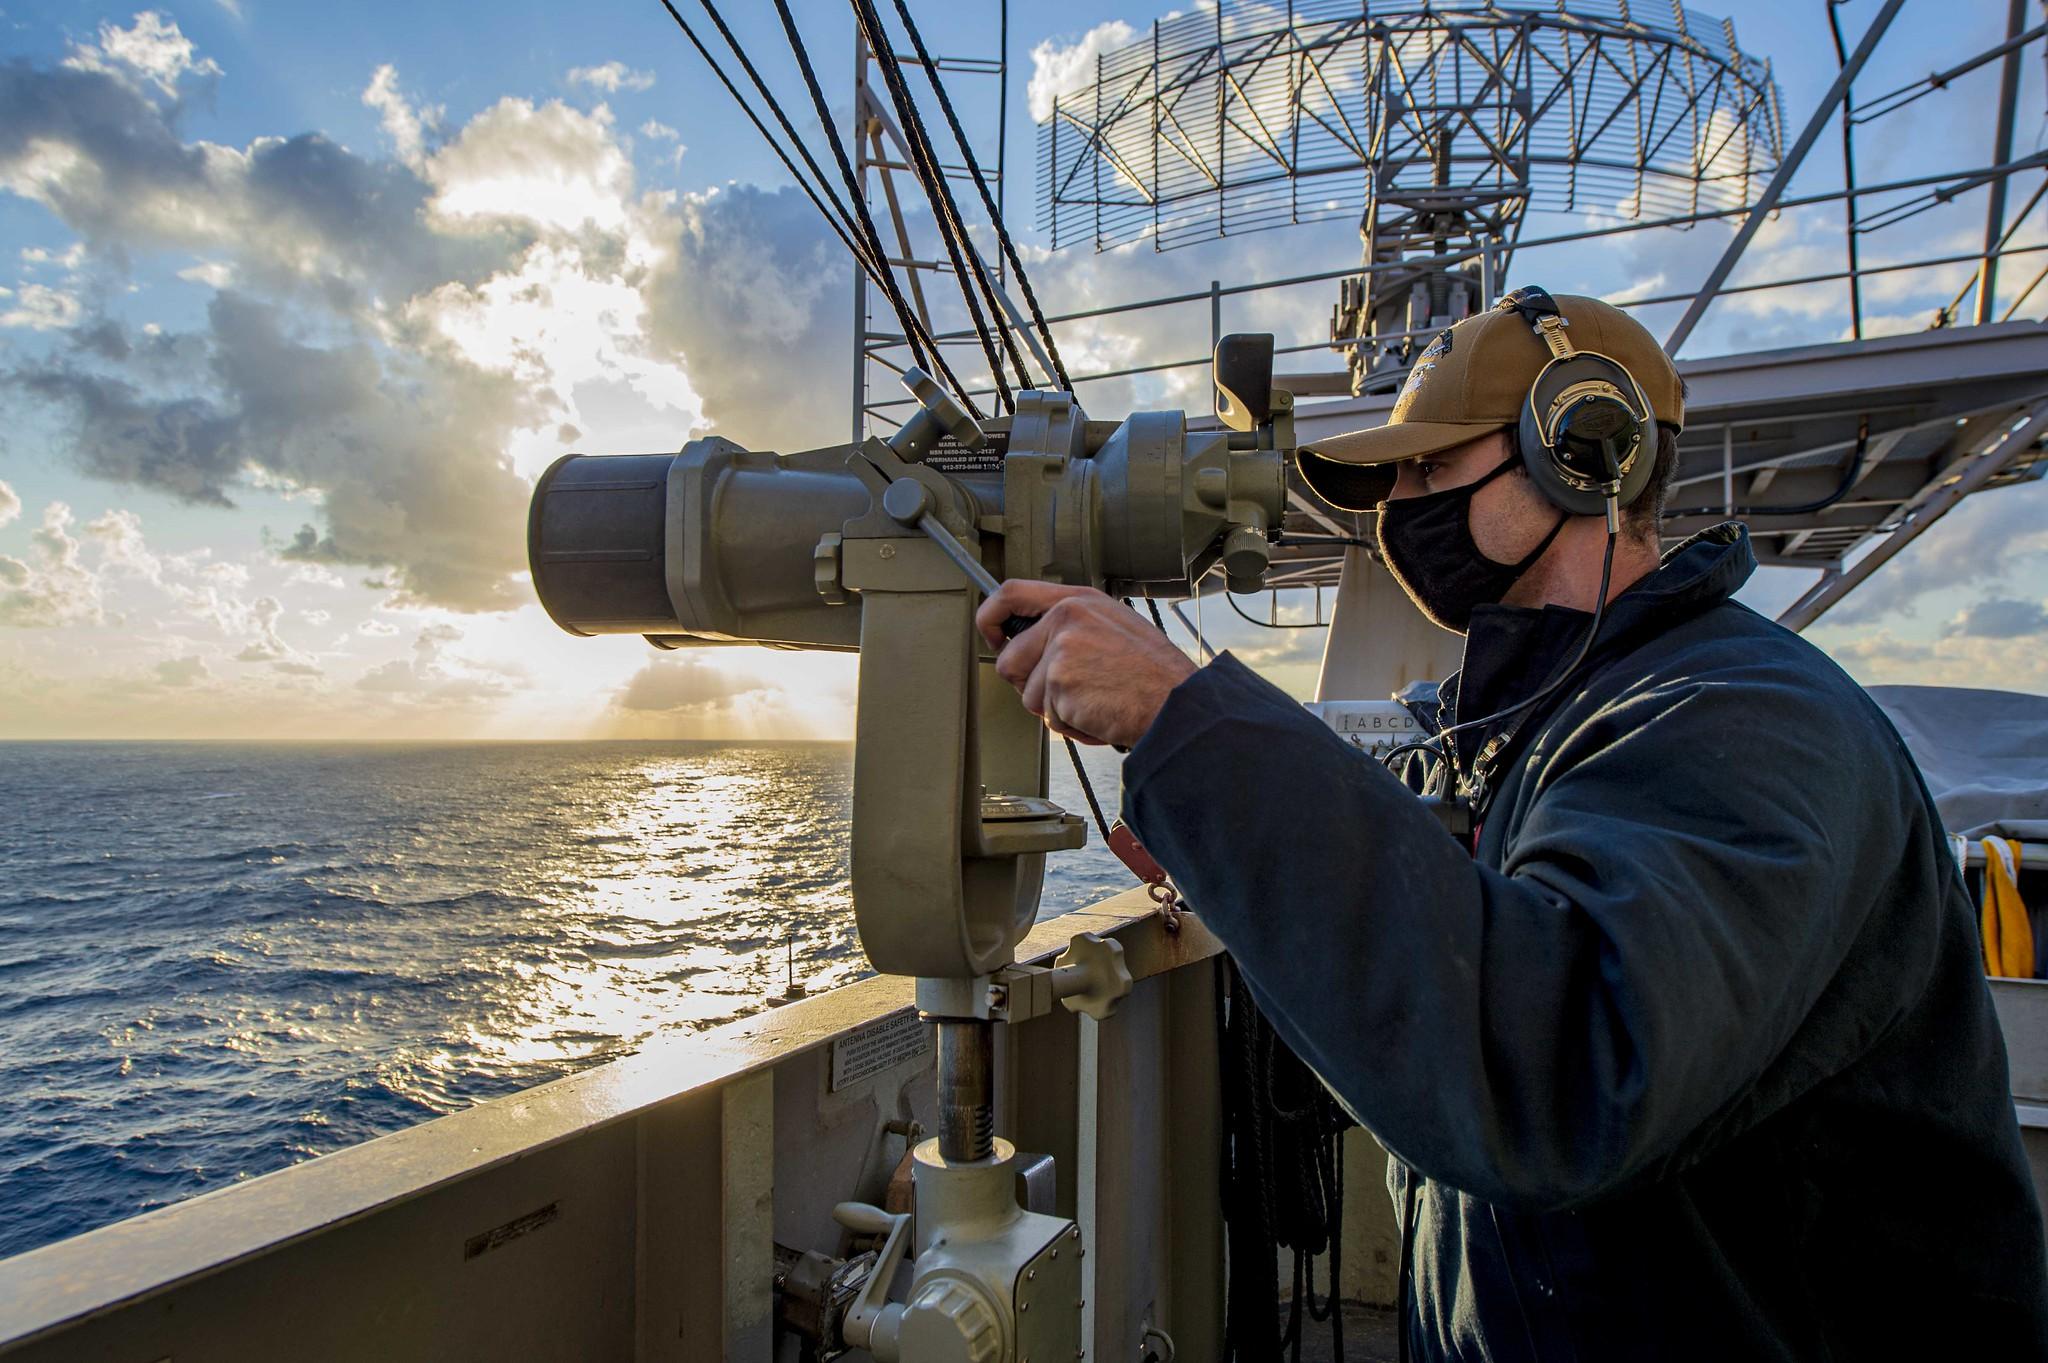 Seaman Cedric Volle stands aft lookout watch aboard the Nimitz-class aircraft carrier USS Dwight D. Eisenhower (CVN 69) in the Mediterranean Sea, April 1, 2021. (Mass Communication Specialist Seaman Jacob Hilgendorf/Navy)